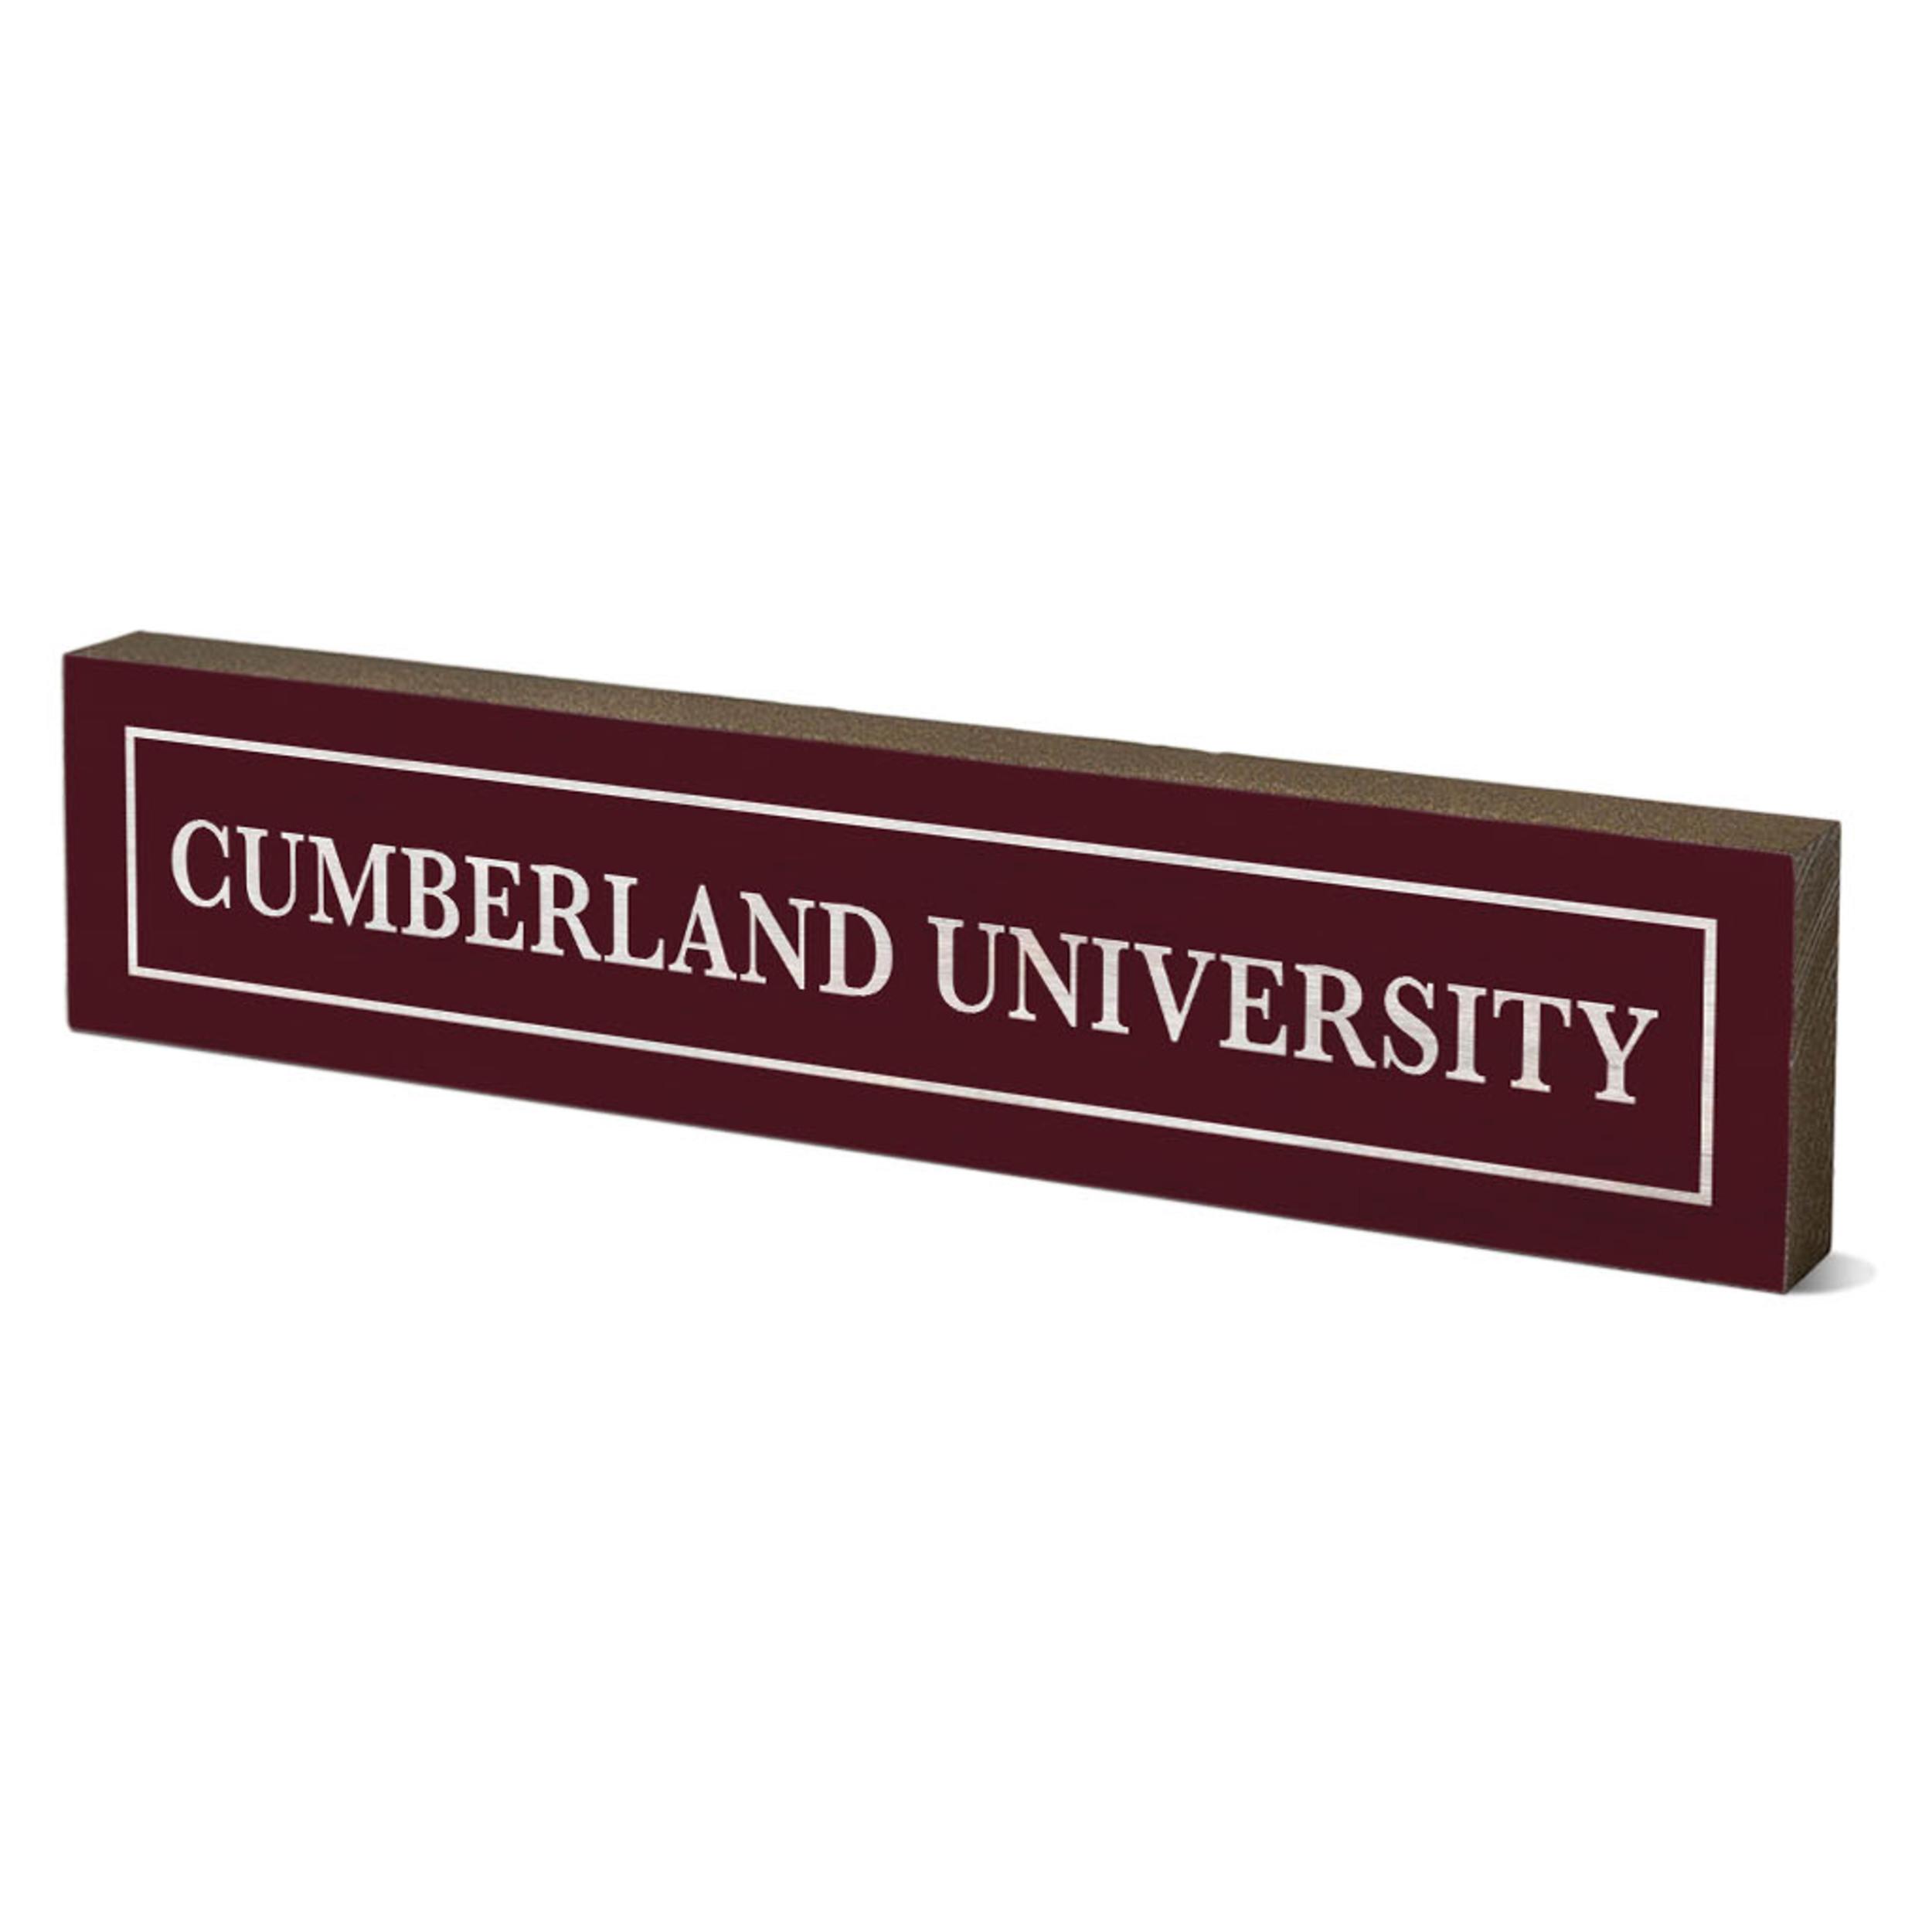 "Cumberland University Table Top Stick 2.5"" x 12"""